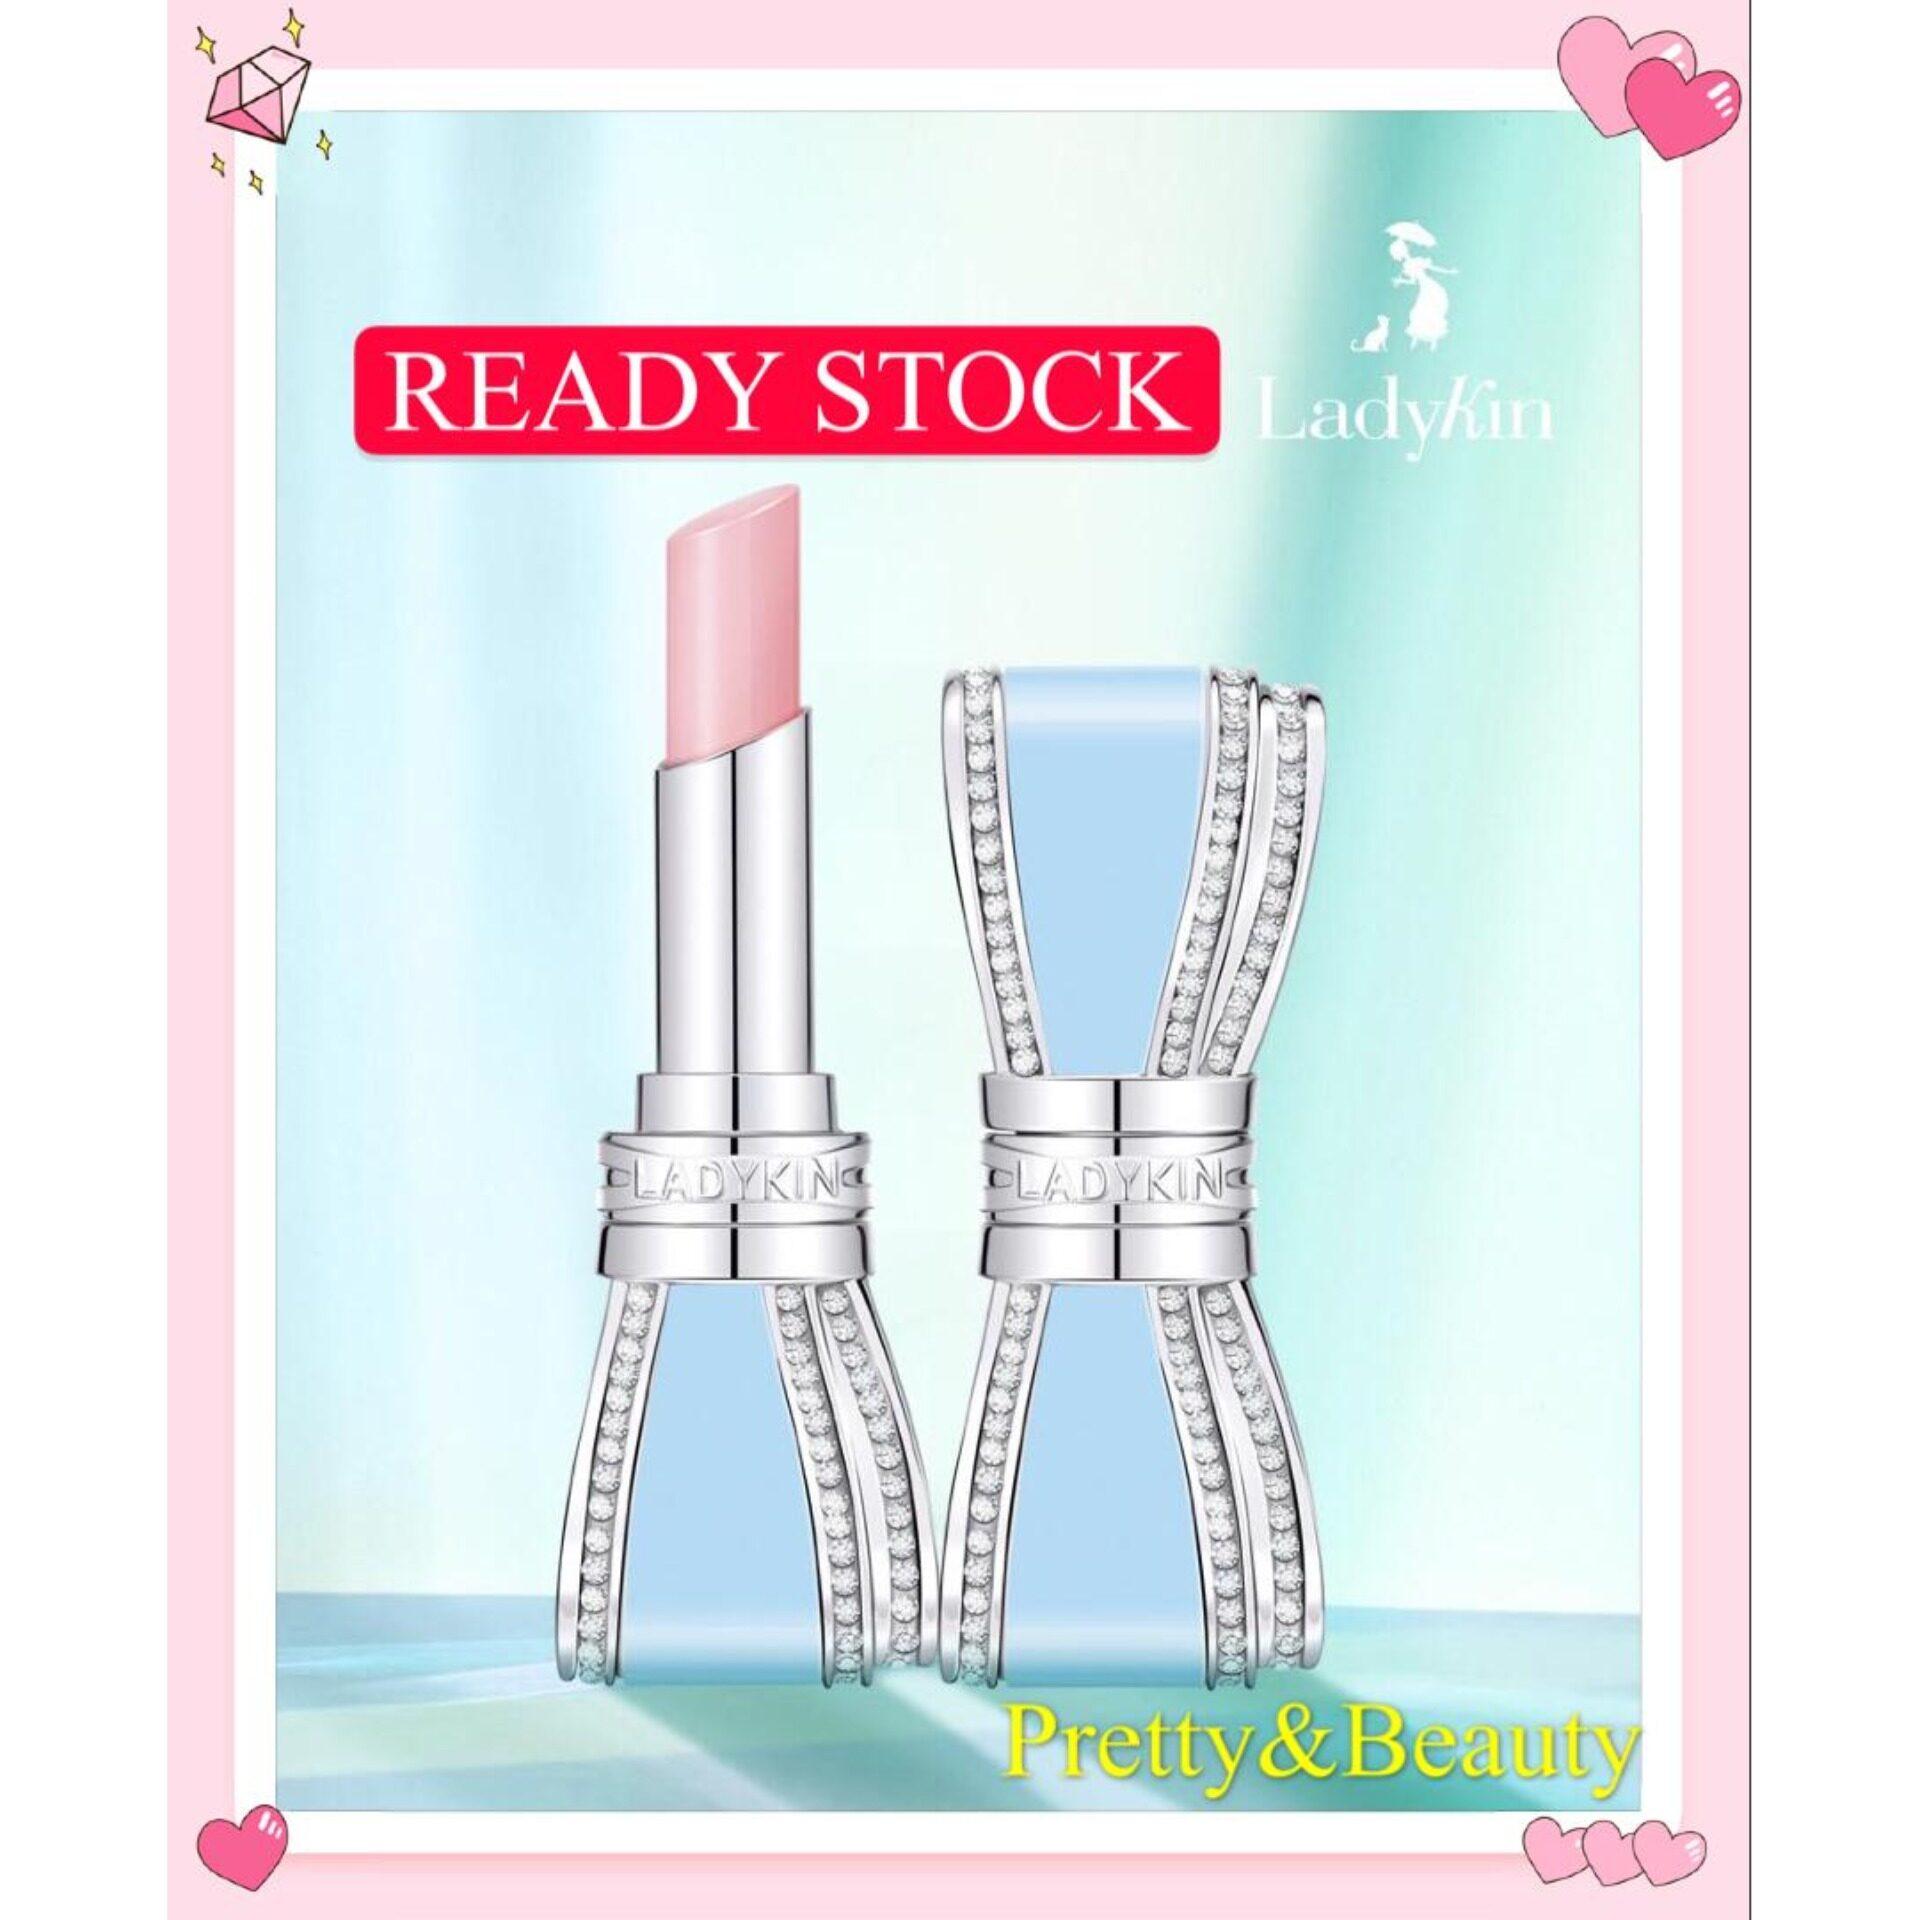 [READY STOCK] LADYKIN 变色润唇膏